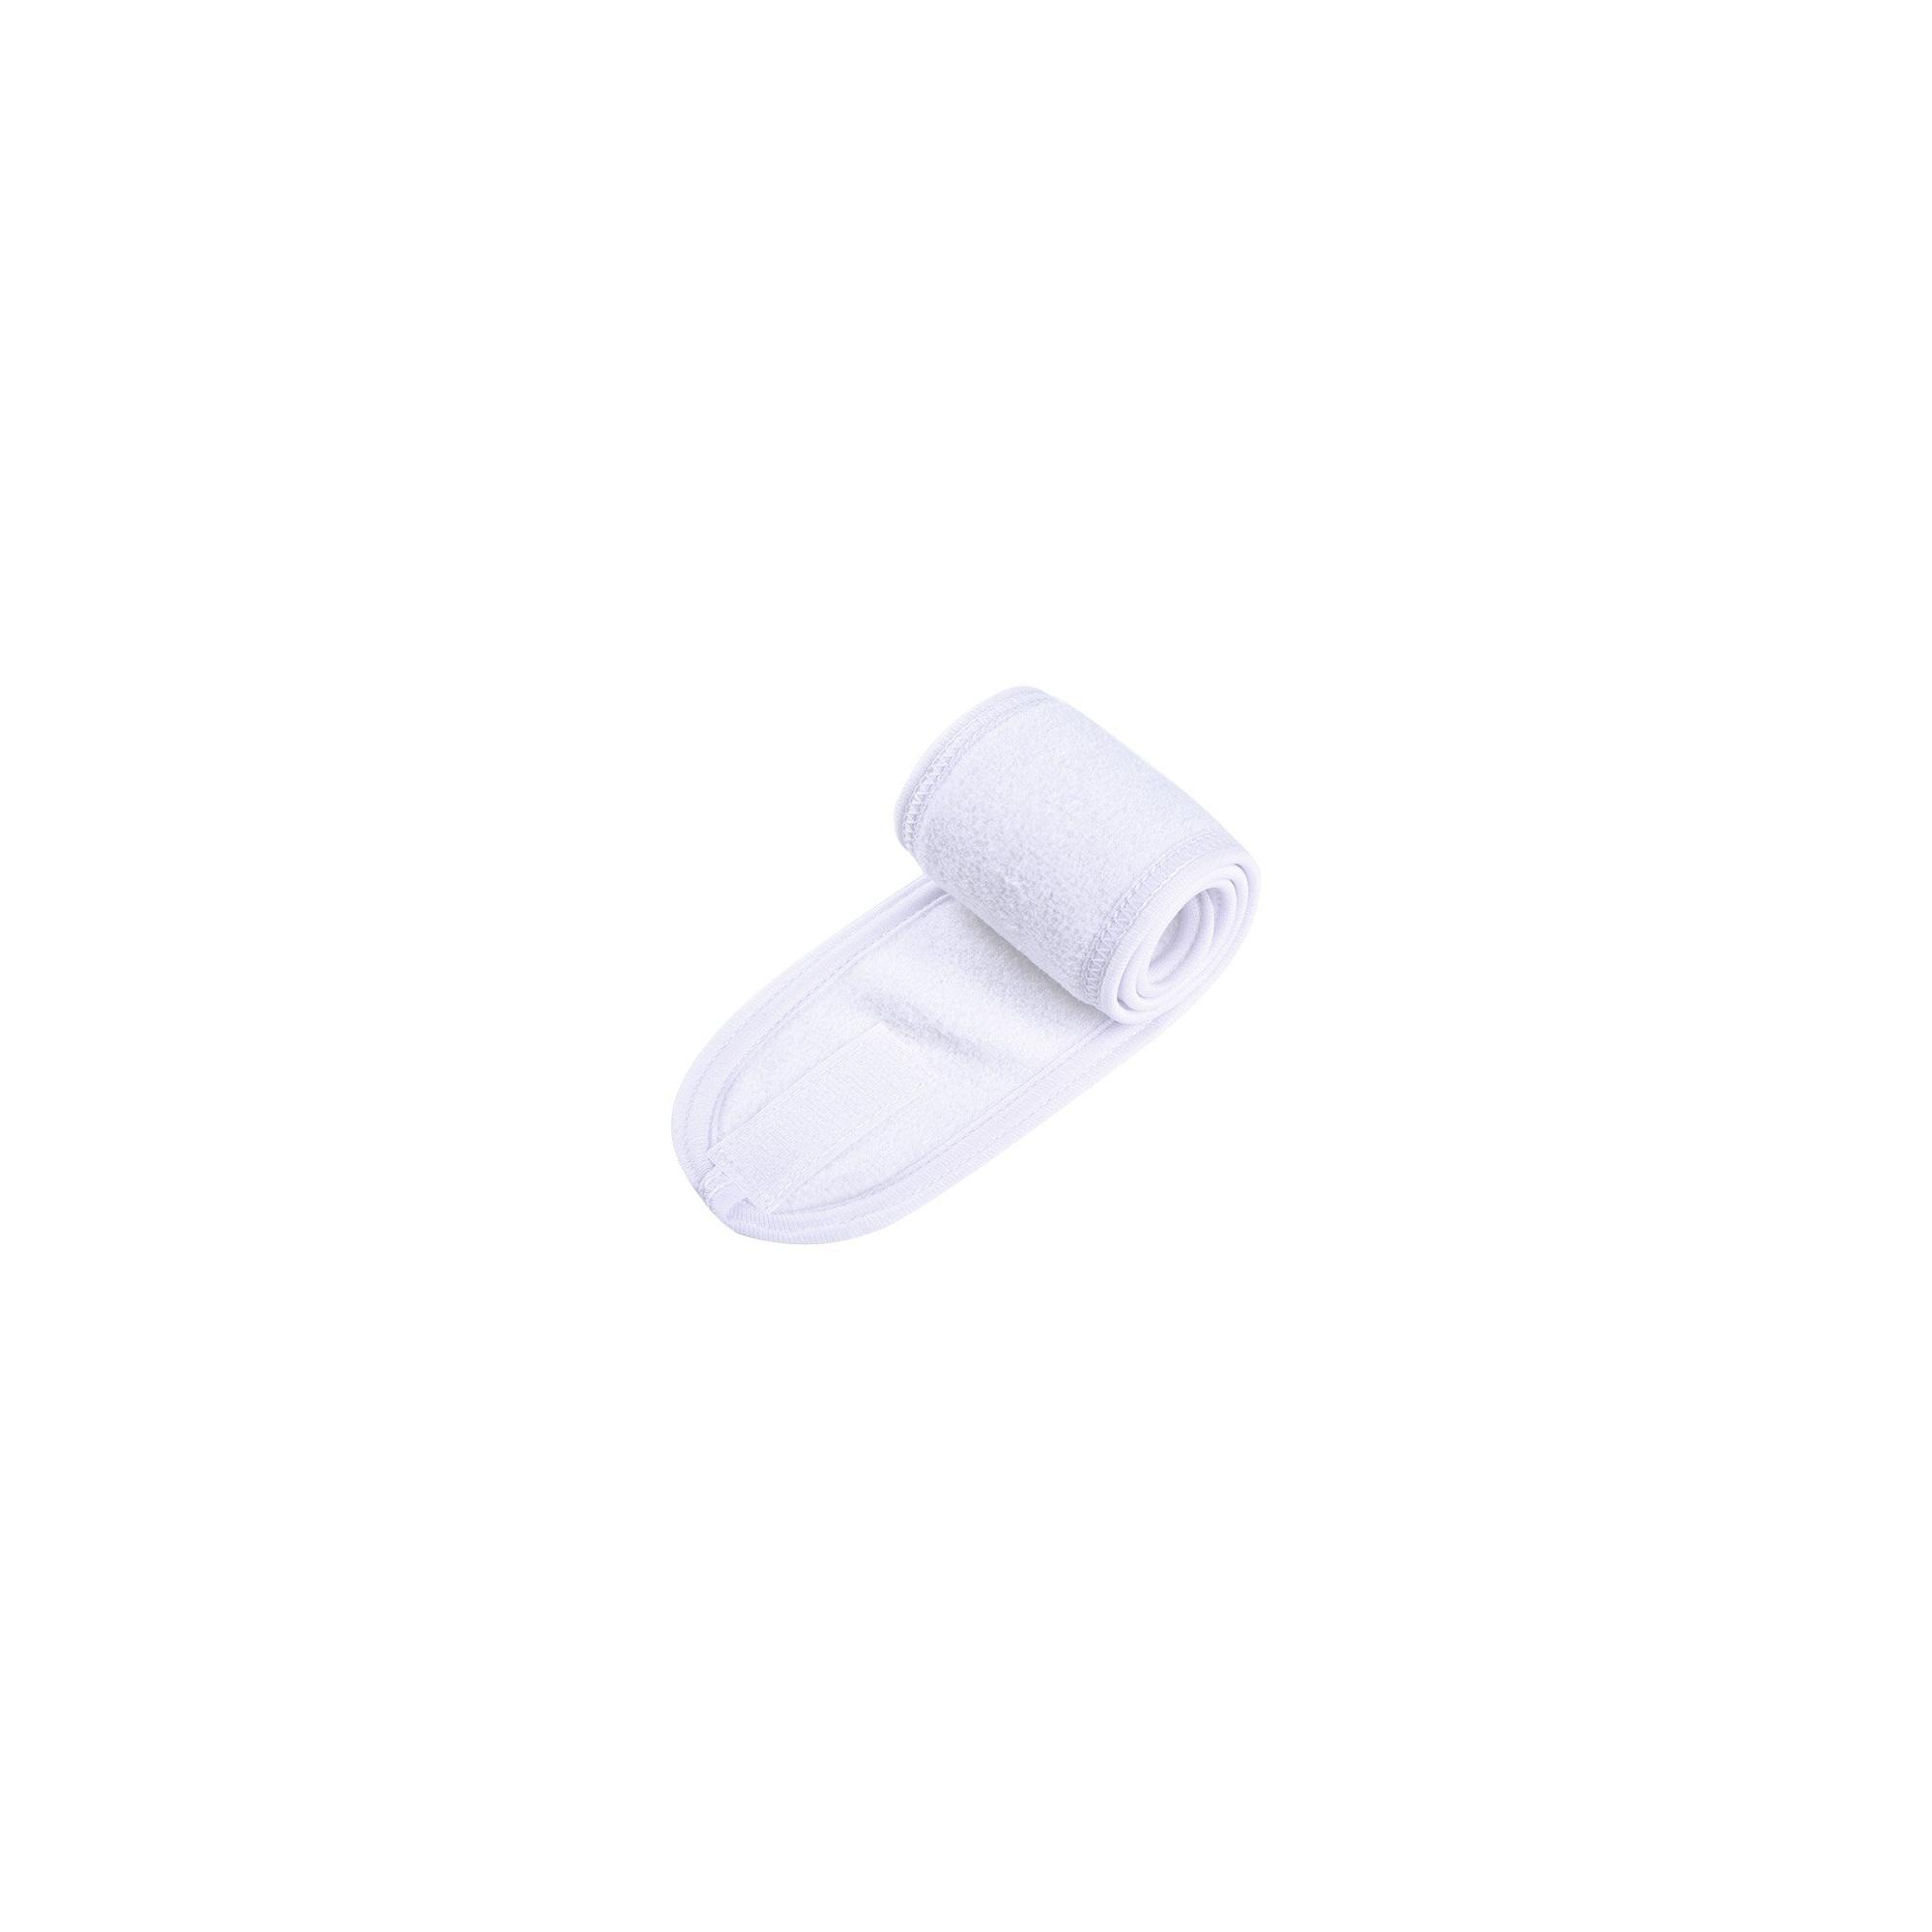 Abbes Cosmetics Bandeau de Maquillage Headband SPA White